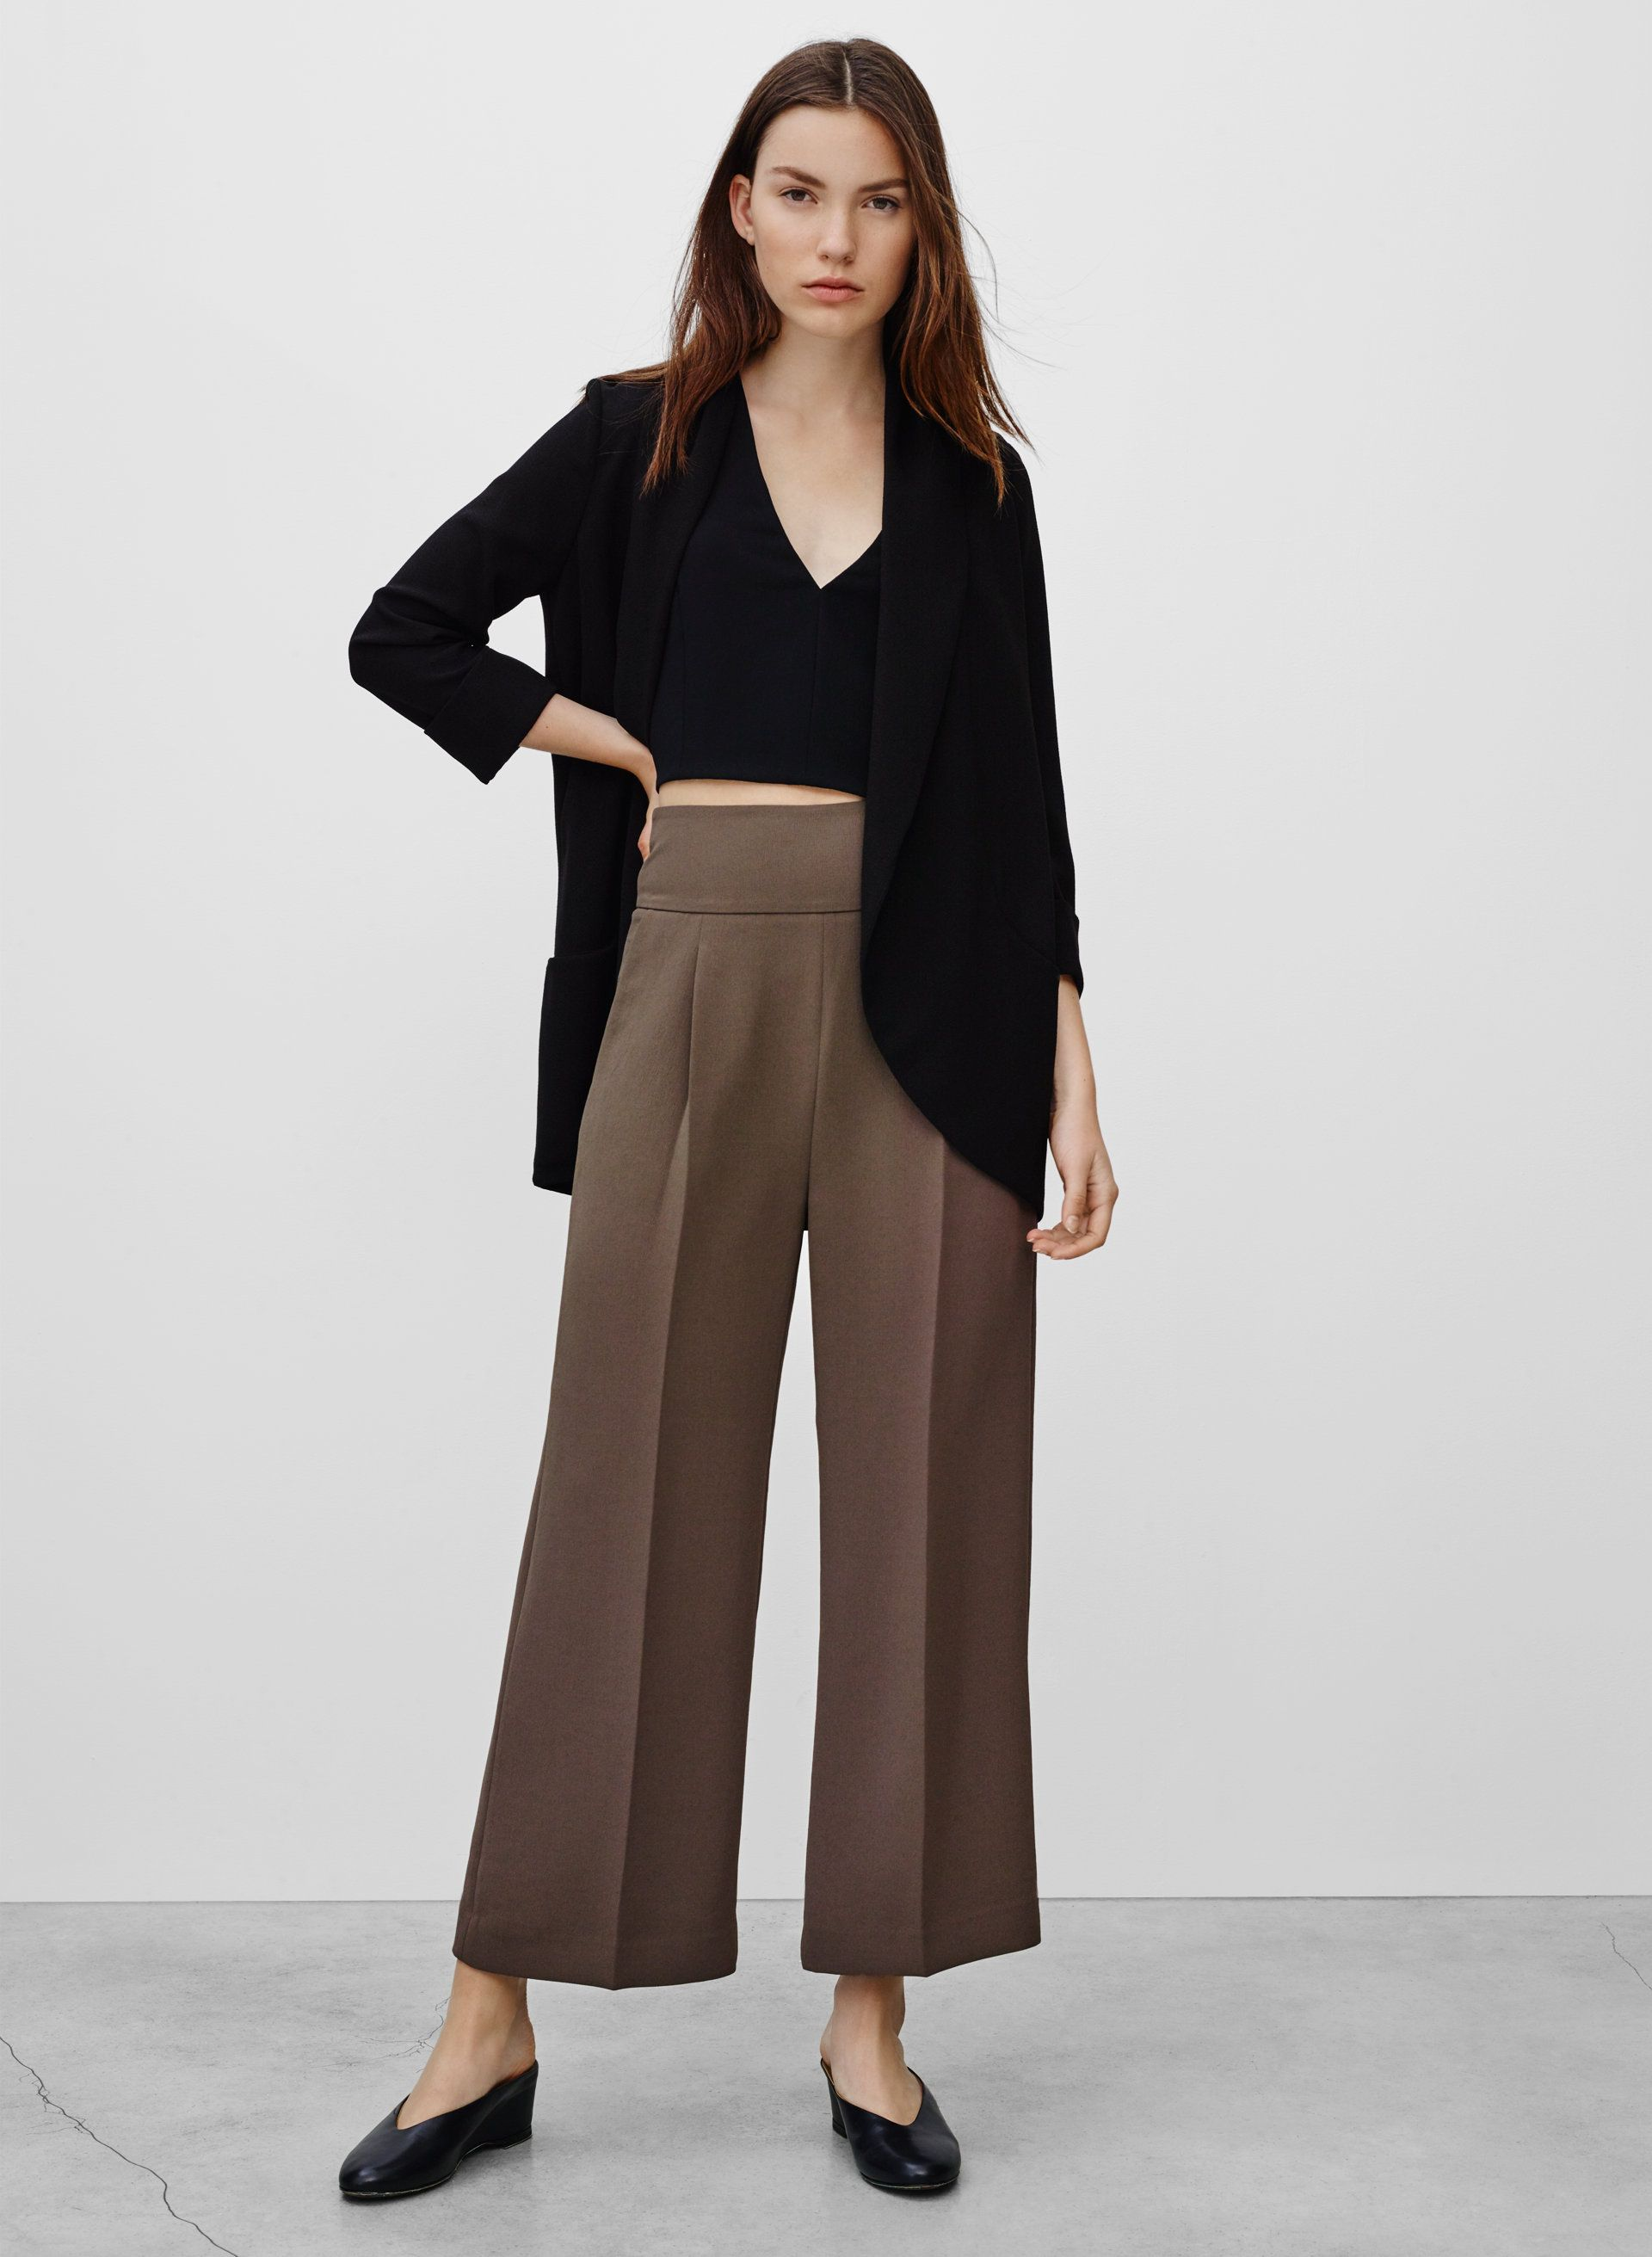 Chevalier jacket | Blazers, Capsule wardrobe and Wide leg pants